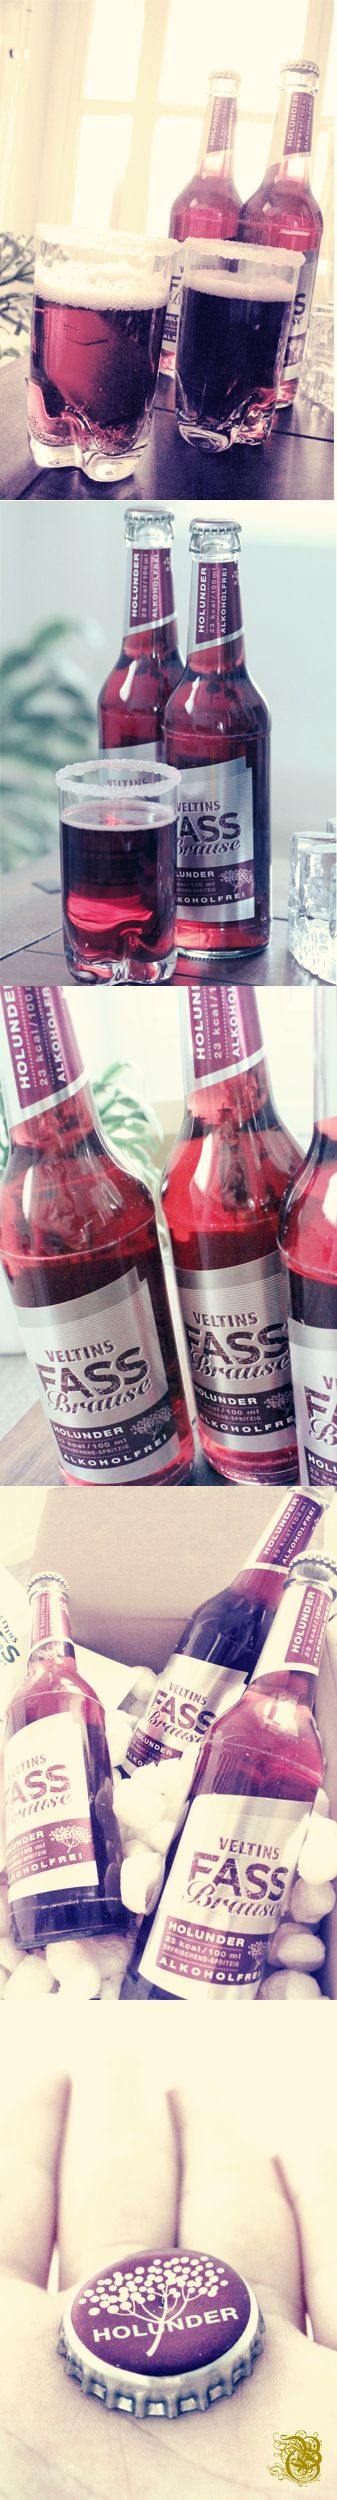 VELTINS Fassbrause Holunder  alcohol-free beer alkoholfreies Bier